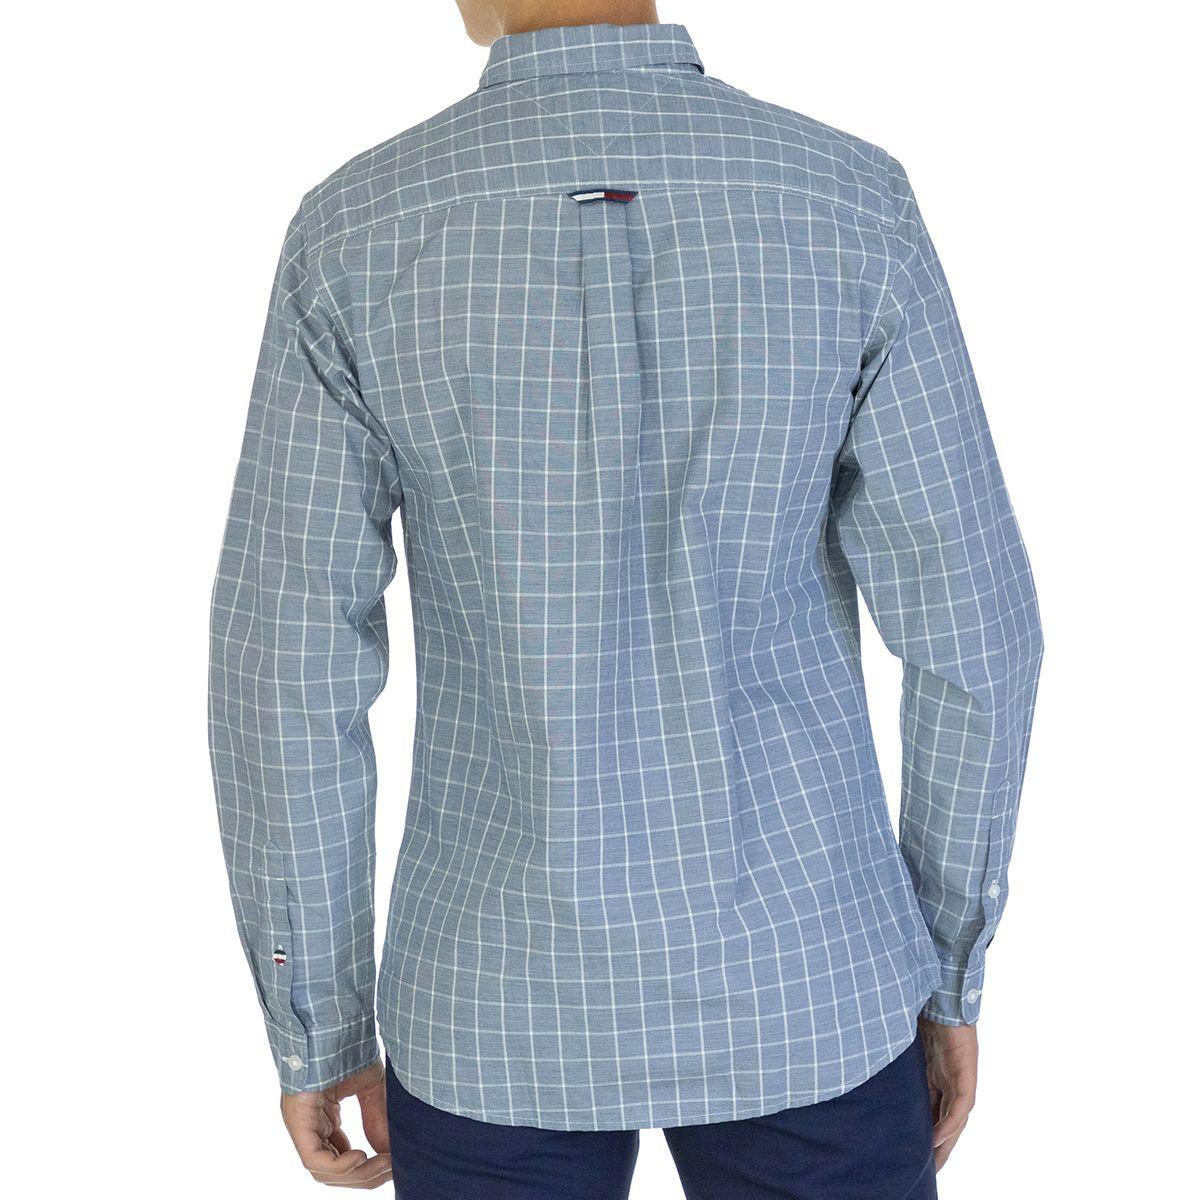 Tommy Hilfiger Men Shirt Windowpane   Full sleeve Blue